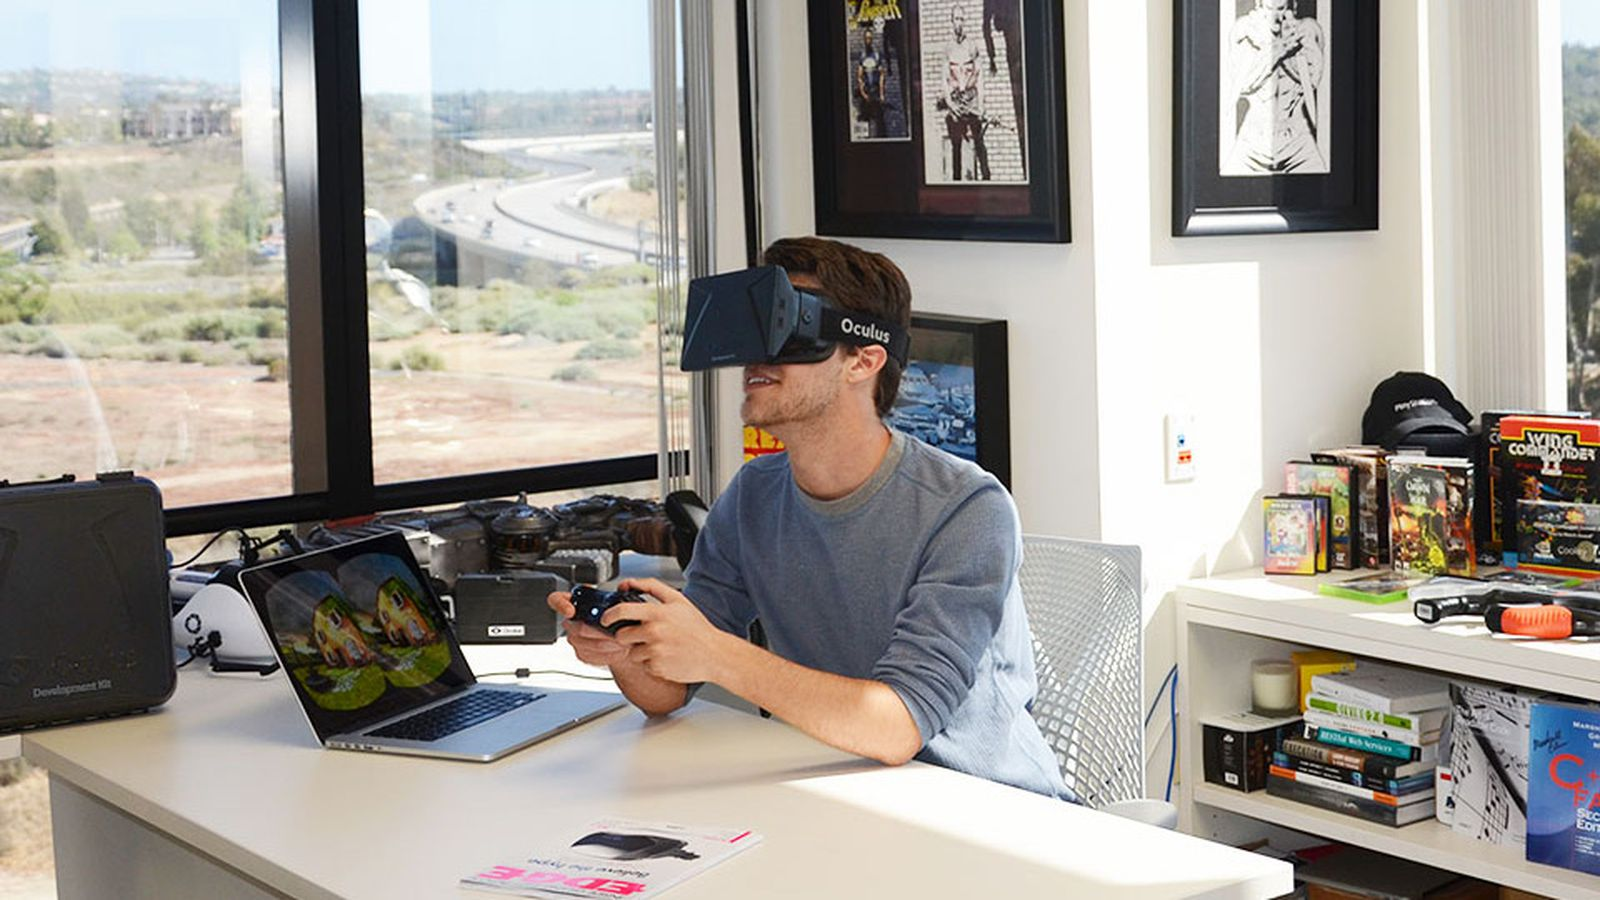 Oculus ZeniMax Suit Is A Transparent Attempt To Take Advantage Of Facebook Acquisition